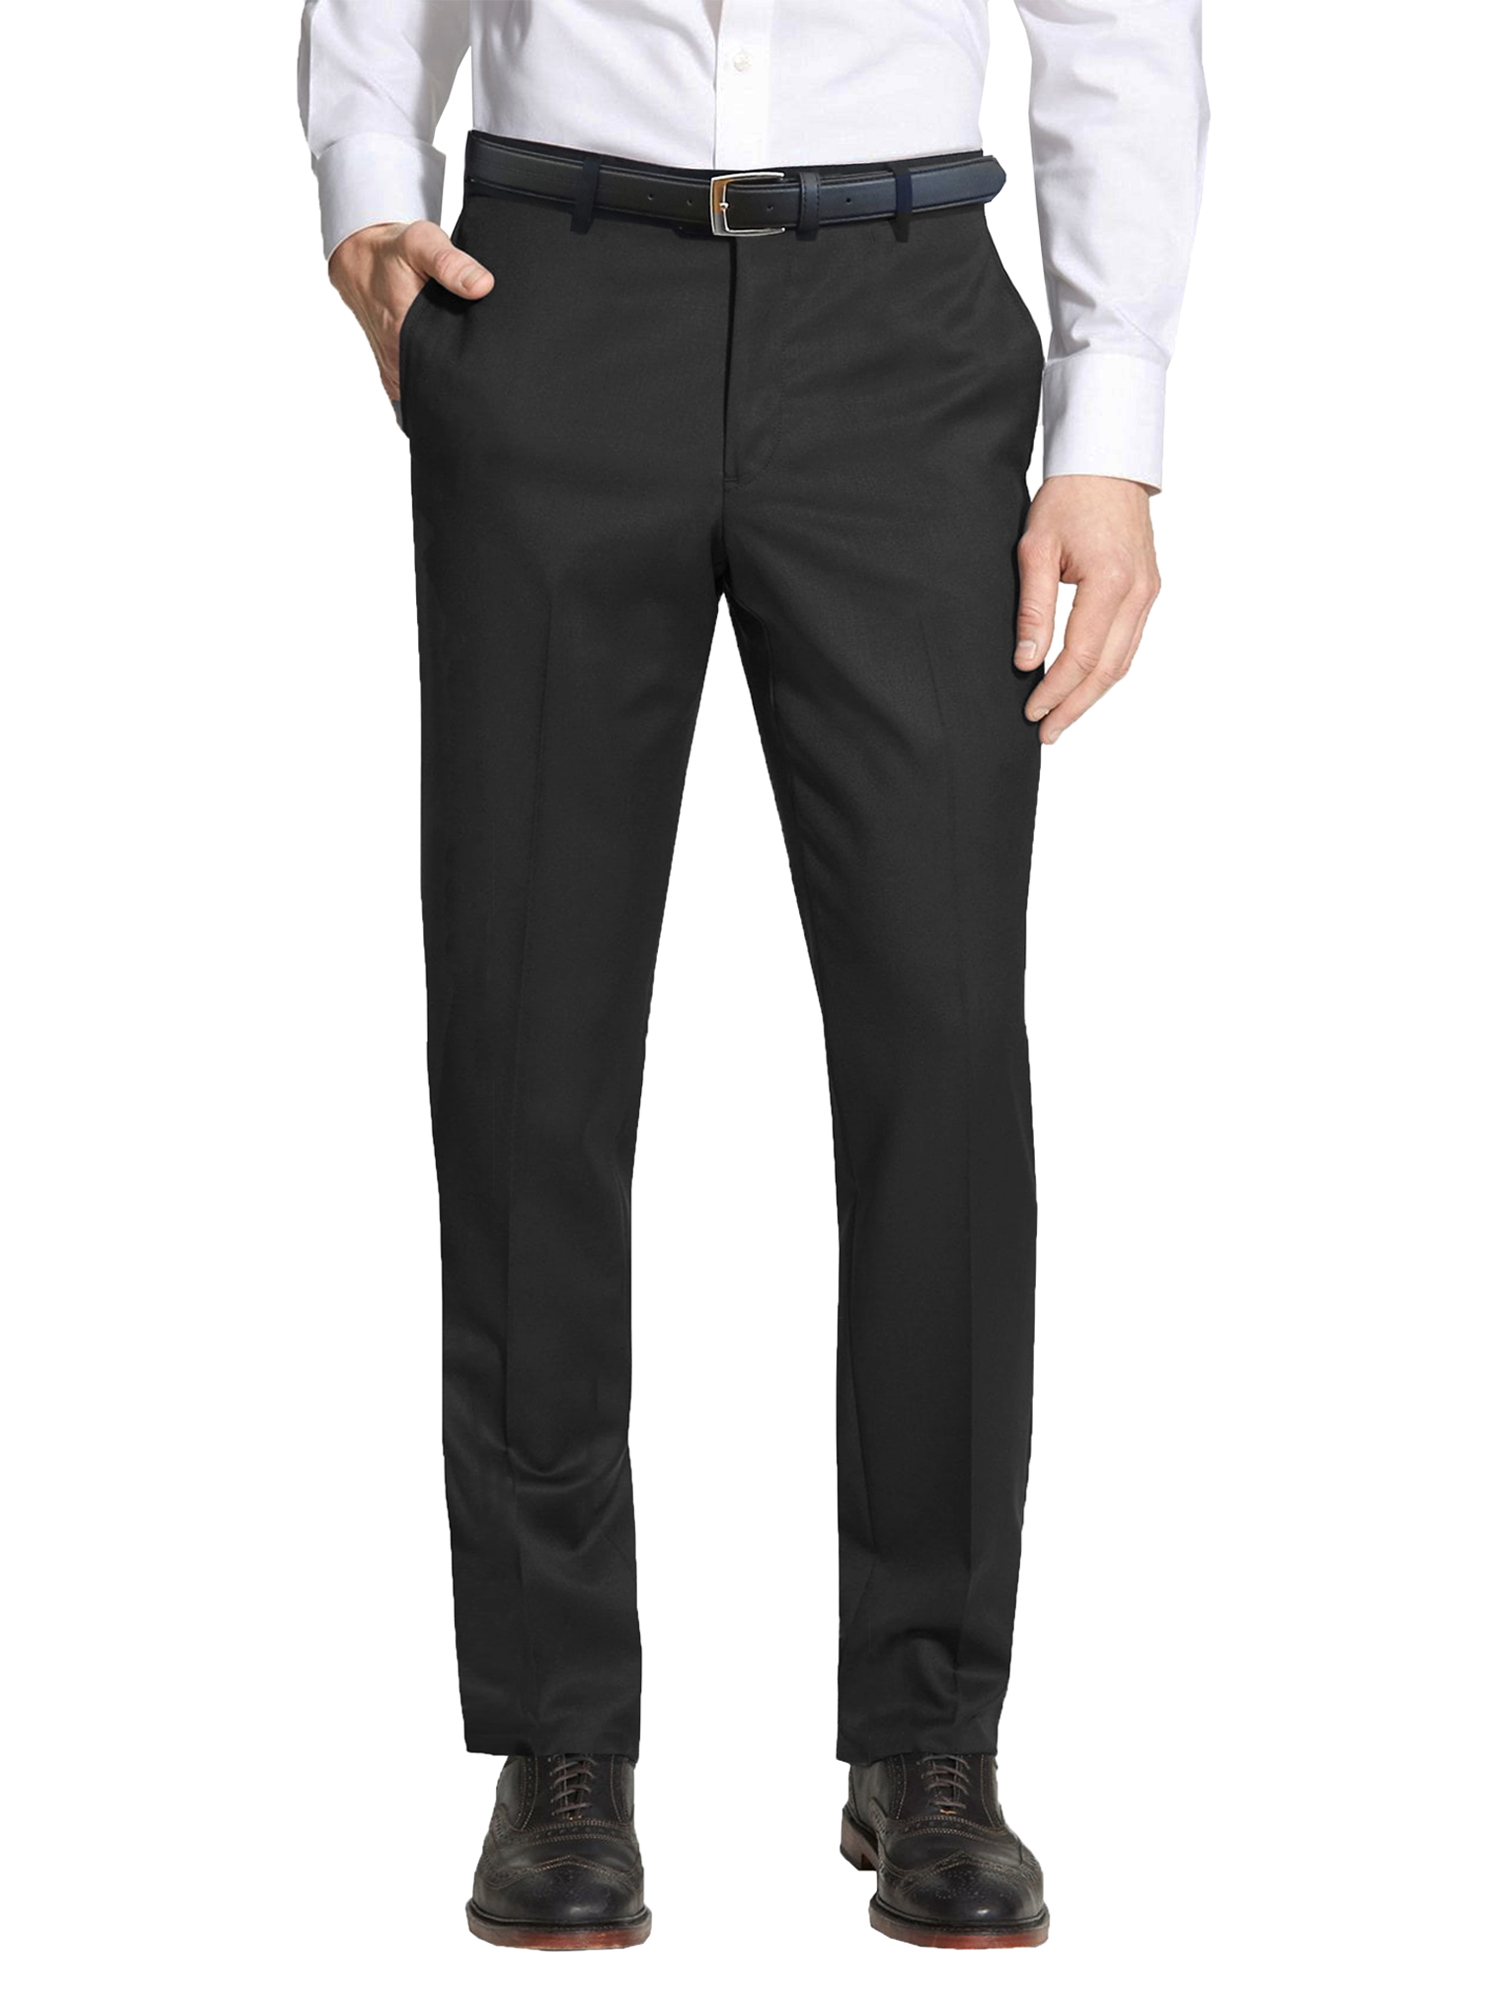 Men's Slim-Fit Belted Casual Dress Pants